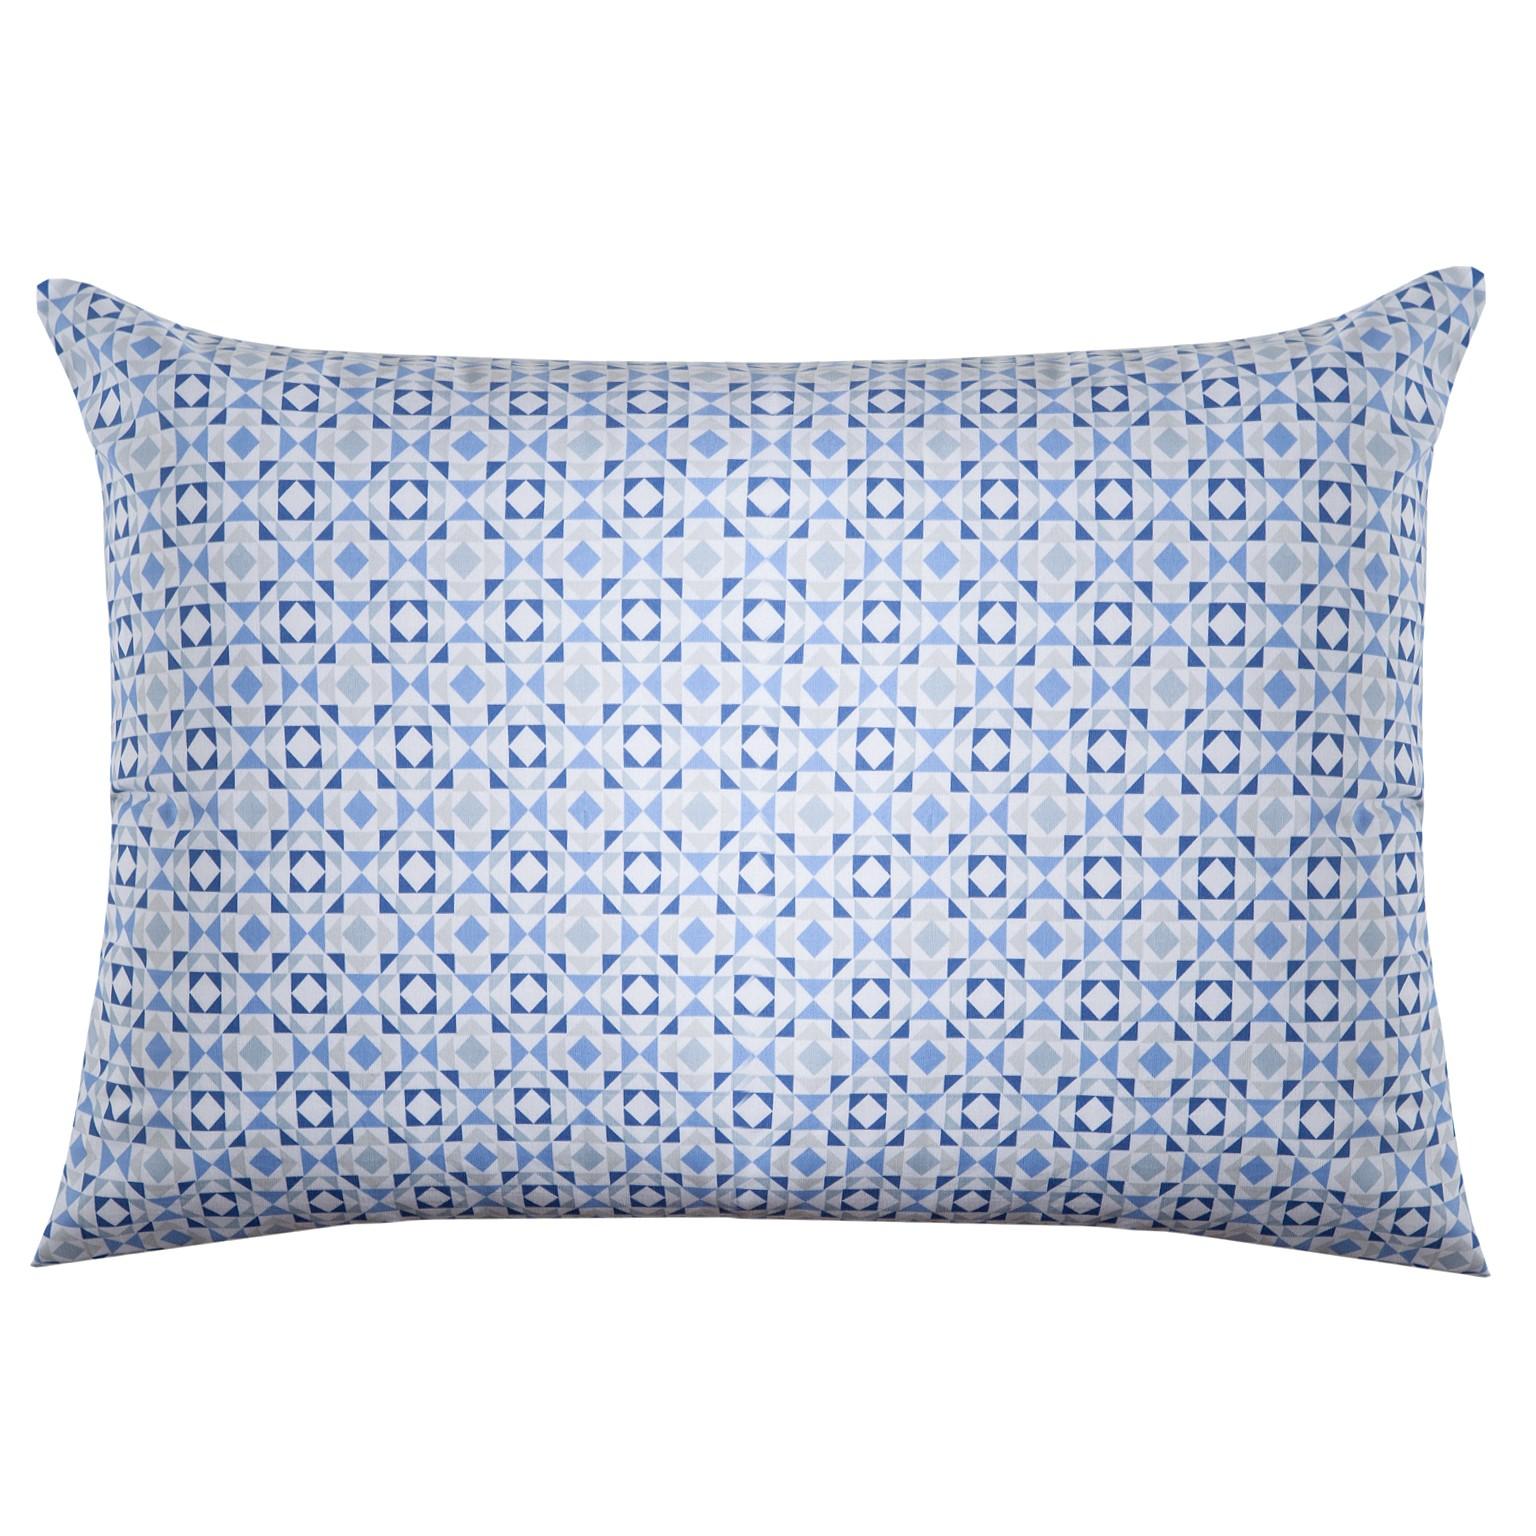 Fronha Royal 50 x 70 Lipe Azul 100 Algodao - Santista